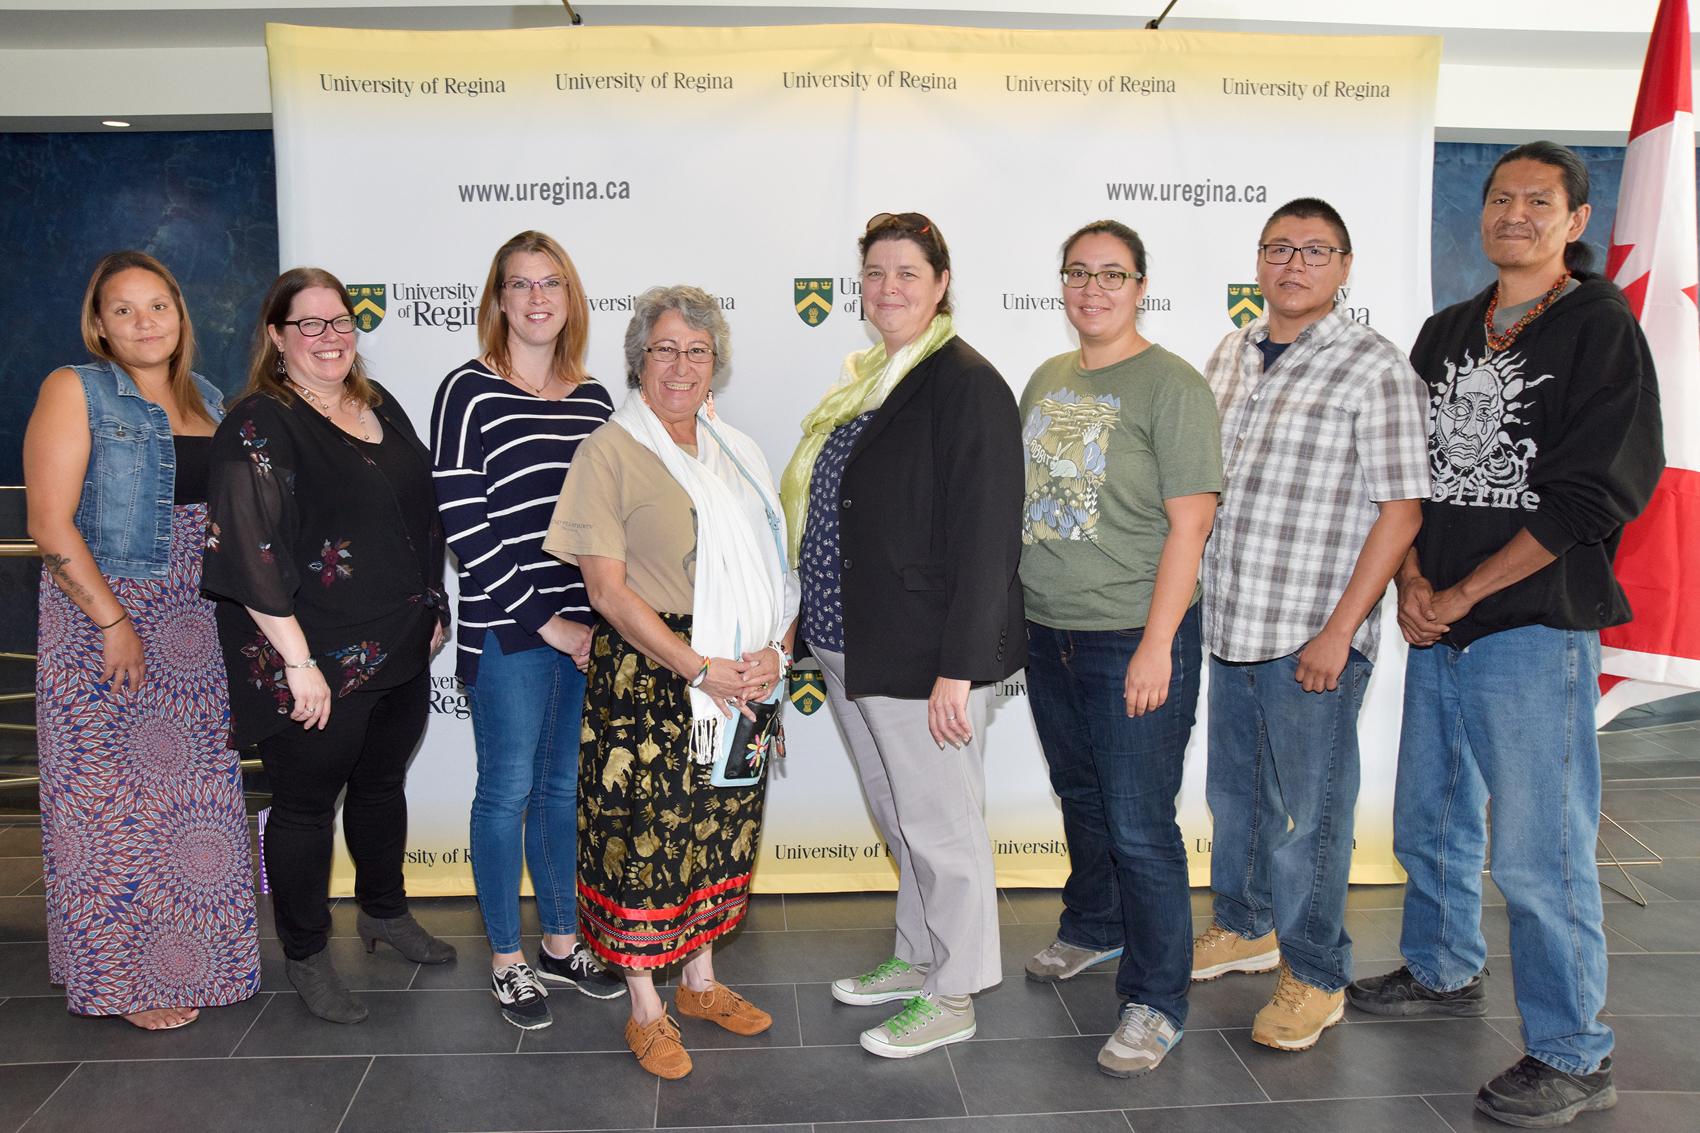 Six individuals standing against the Universit of Regina media wall.